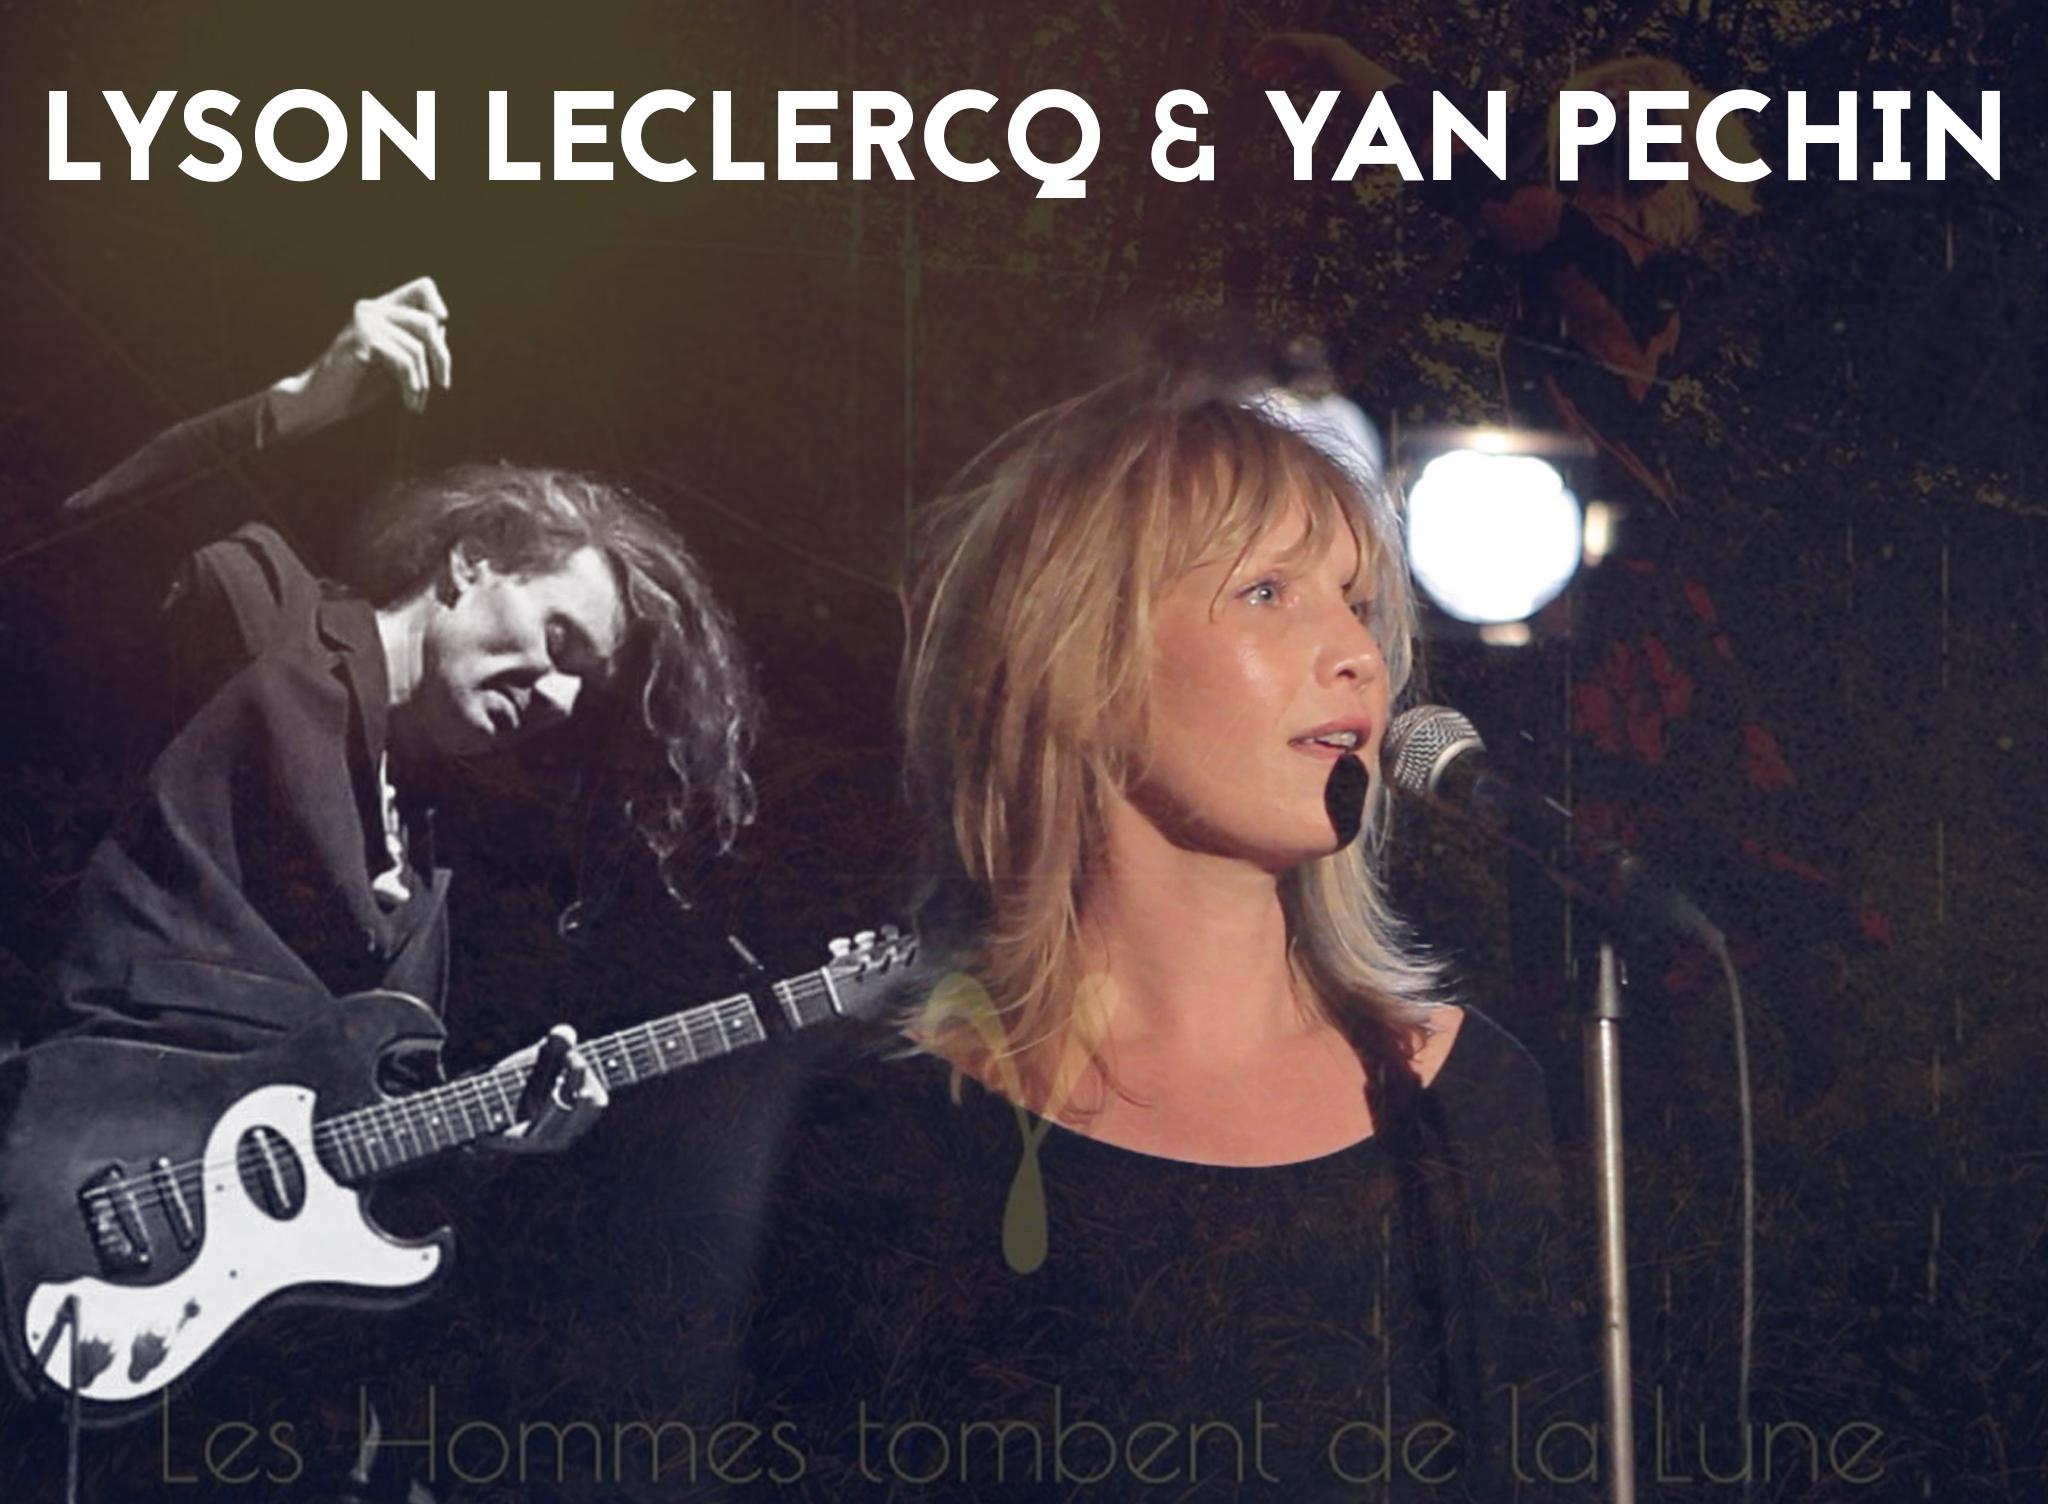 LYSON LECLERCQ & YAN PECHIN